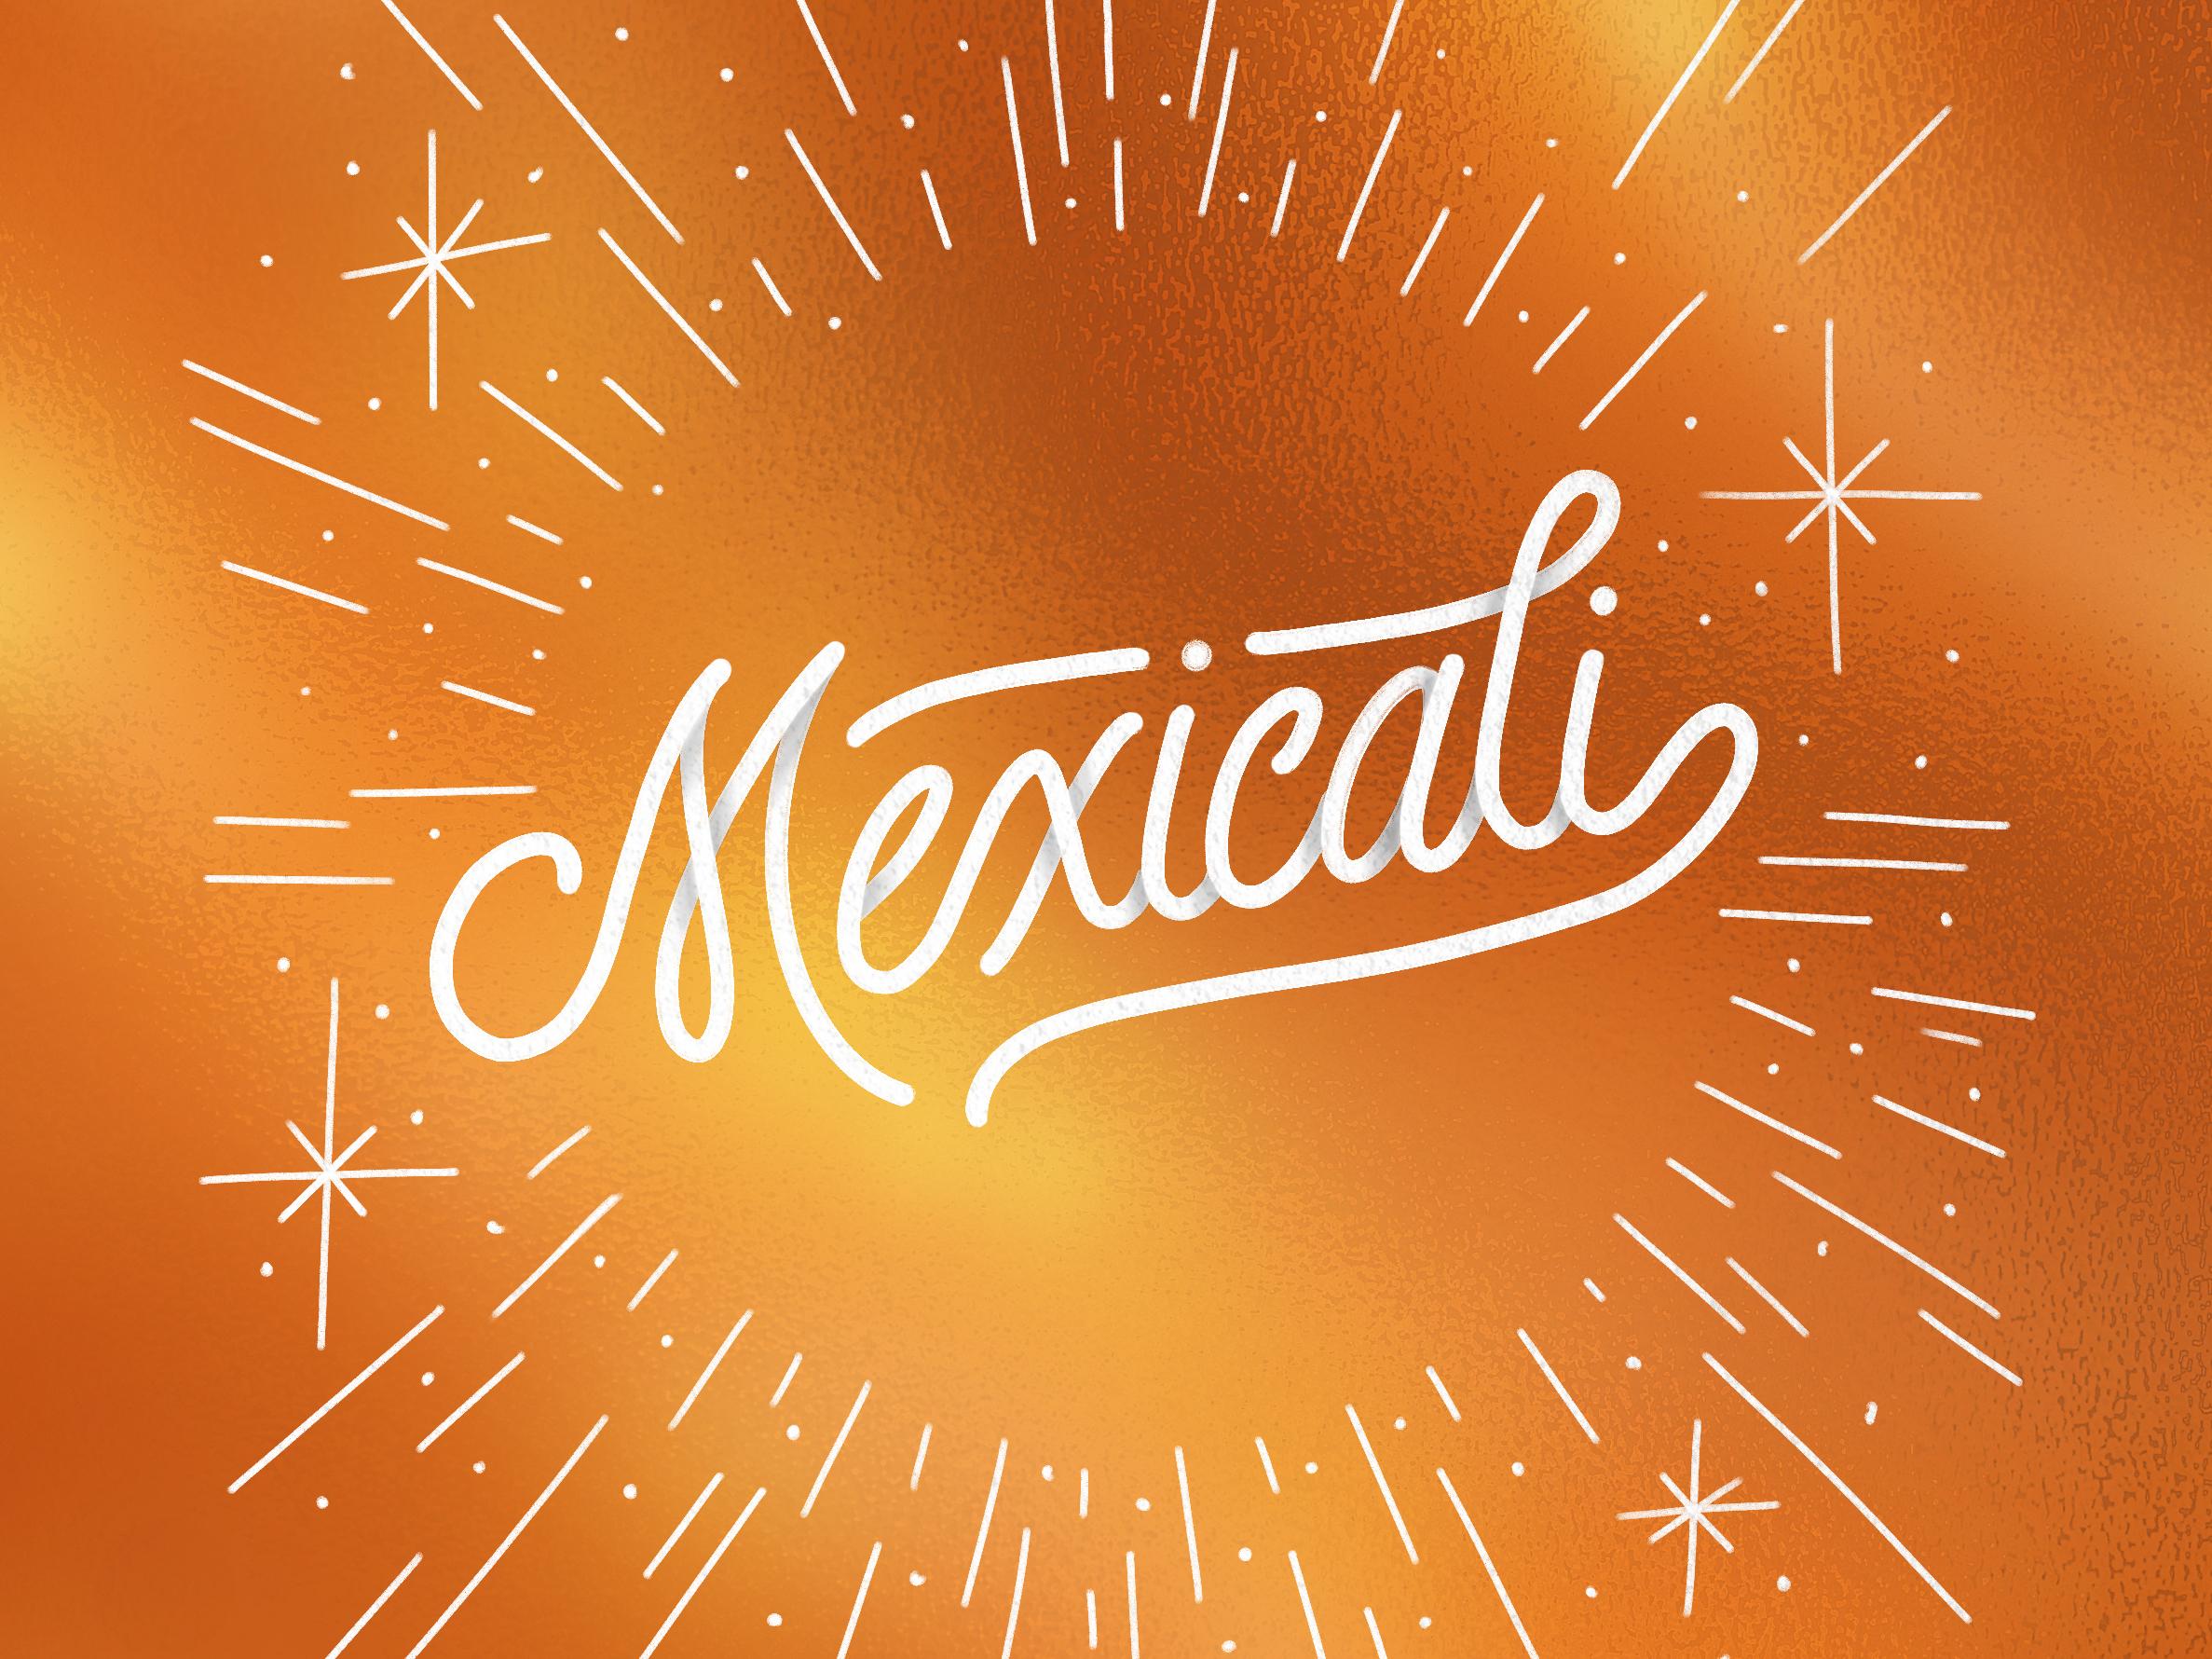 Mexicali2